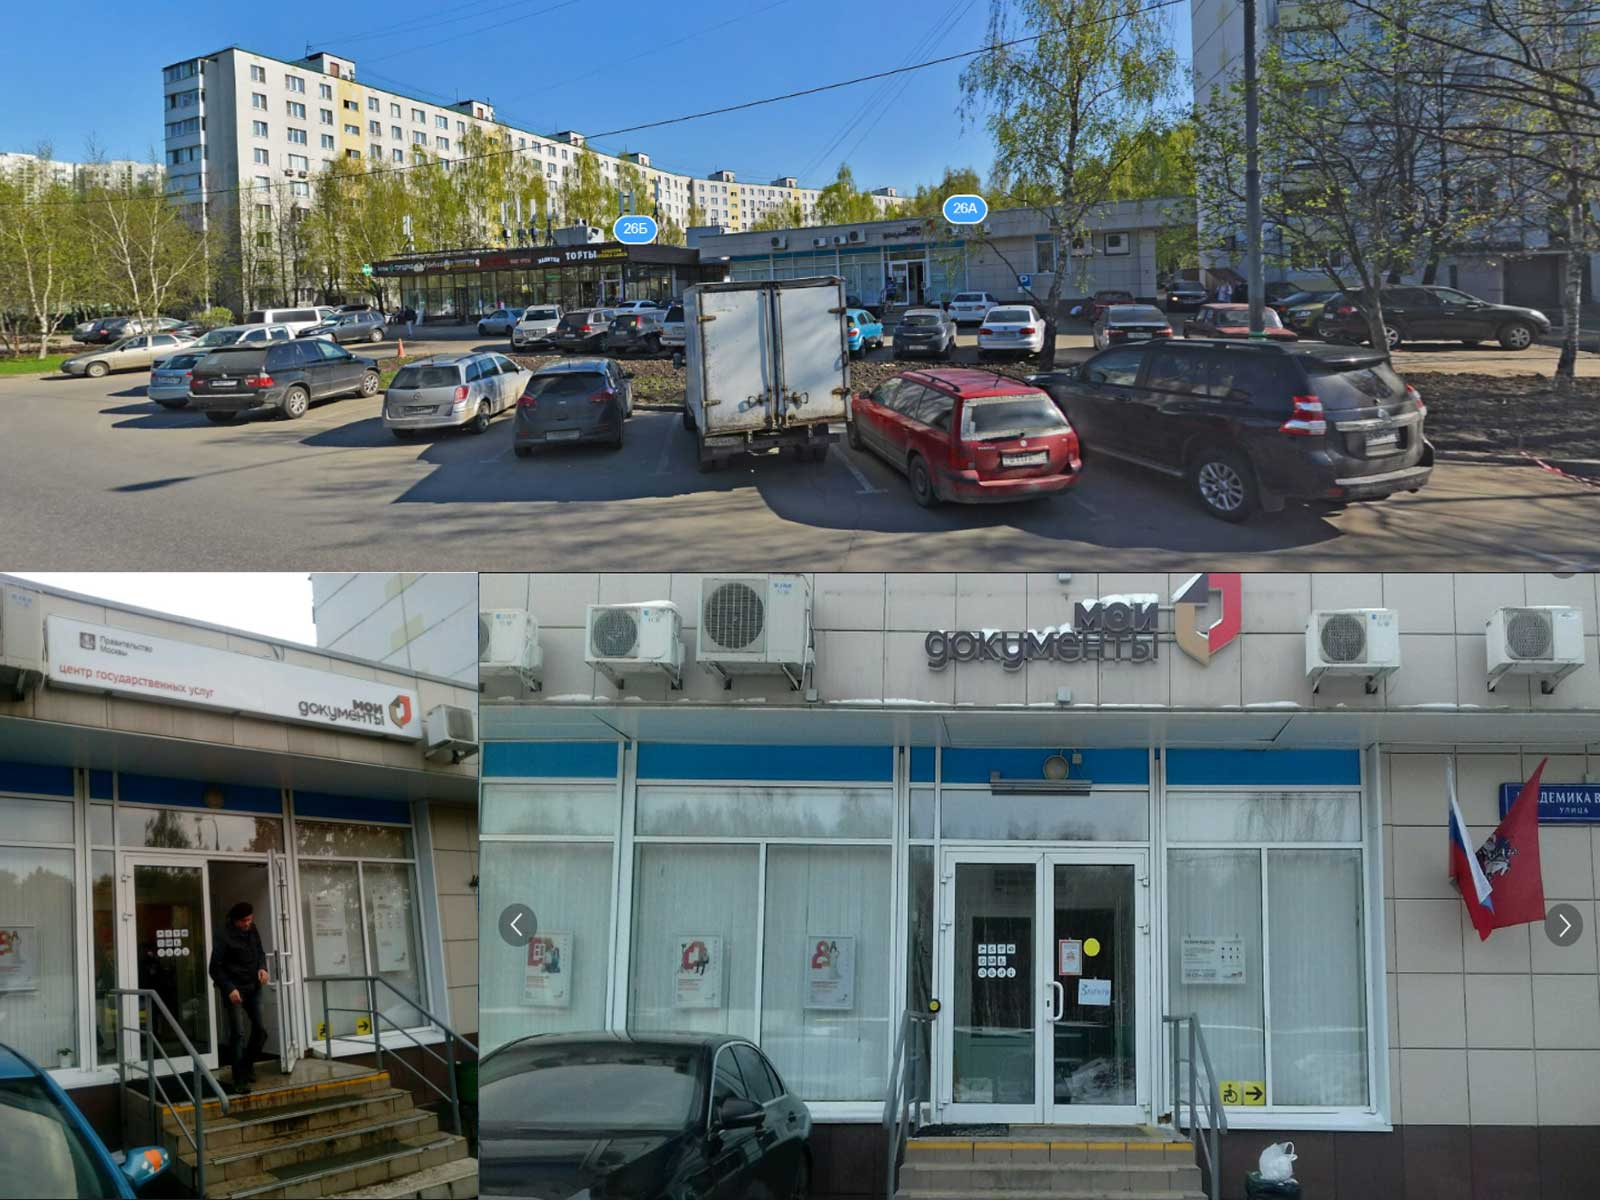 Отдел УФМС по району Теплый Стан, ул. Академика Варги, 26А, Москва